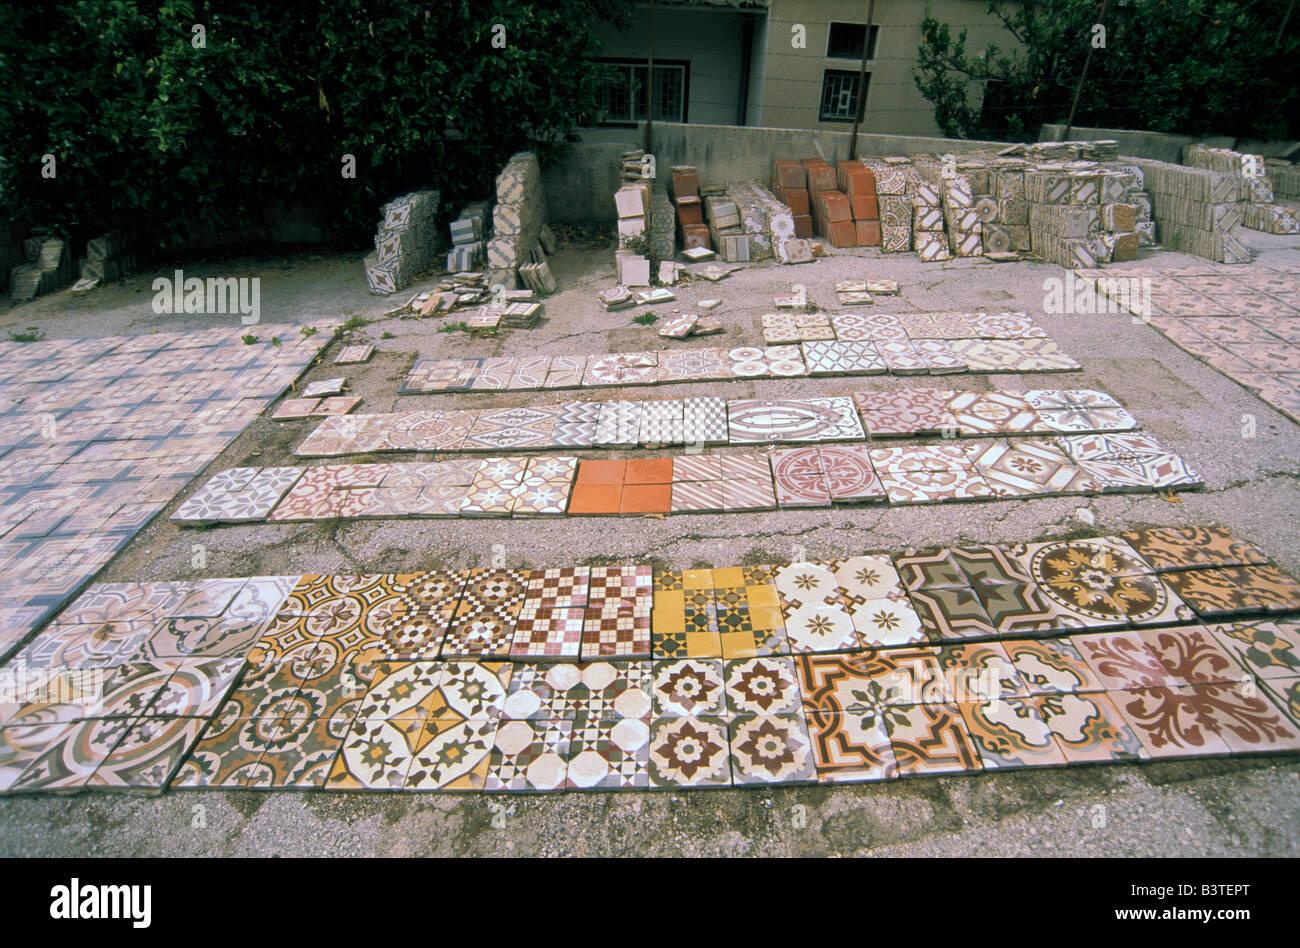 Asia, Lebanon, Beirut. Tile and mosaic refurbishing factory. - Stock Image